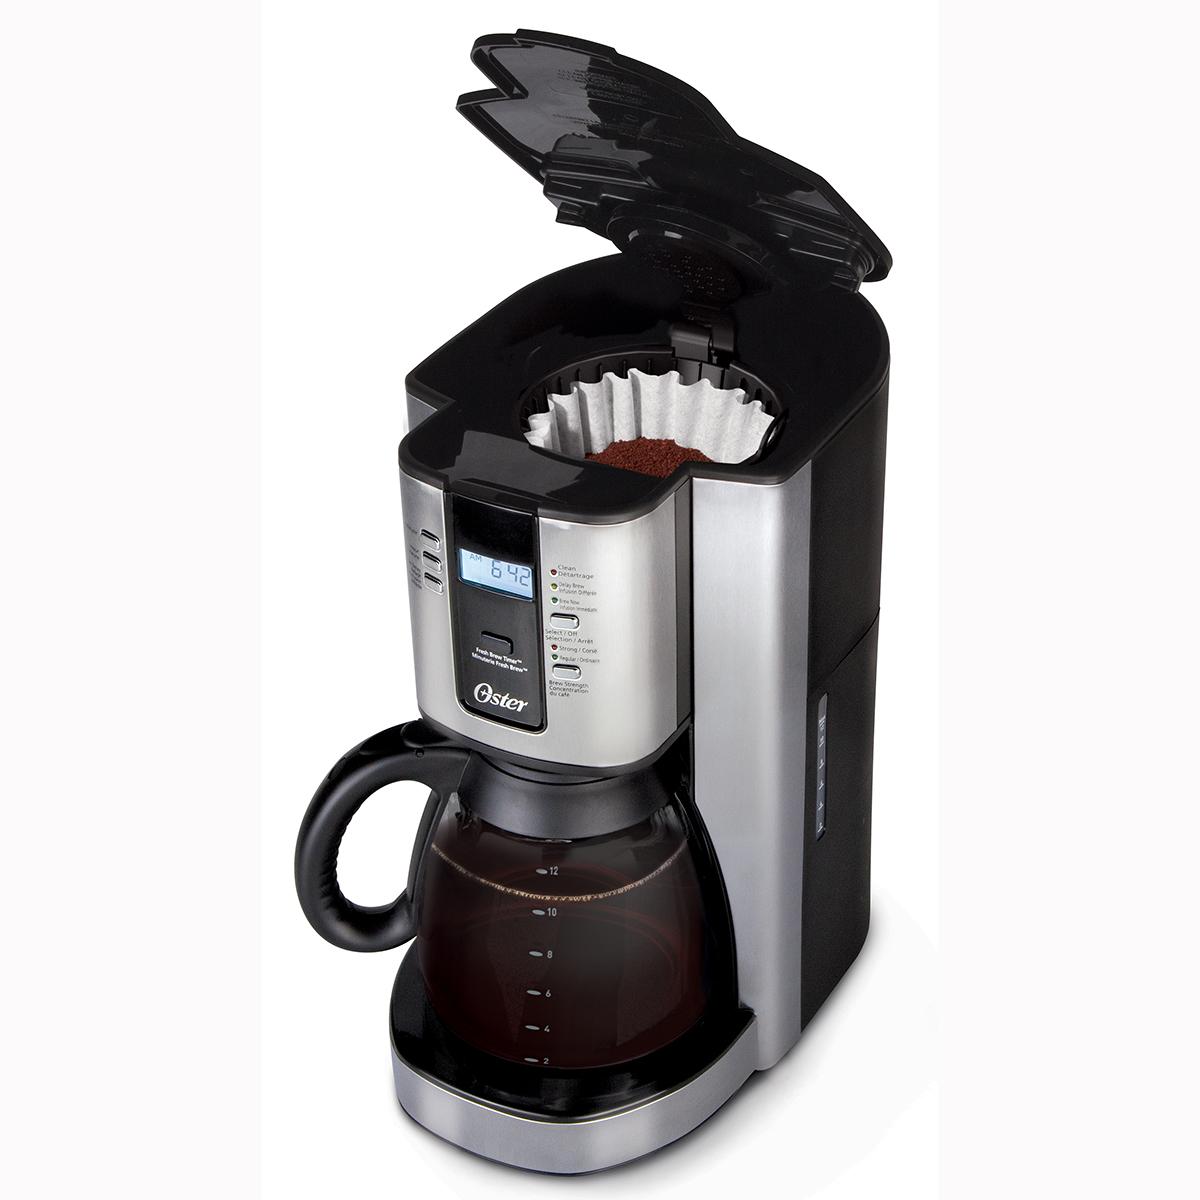 Cafeti Re Oster Programmable 12 Tasses En Acier Inoxydable Bvsttjx37 033 Oster Canada